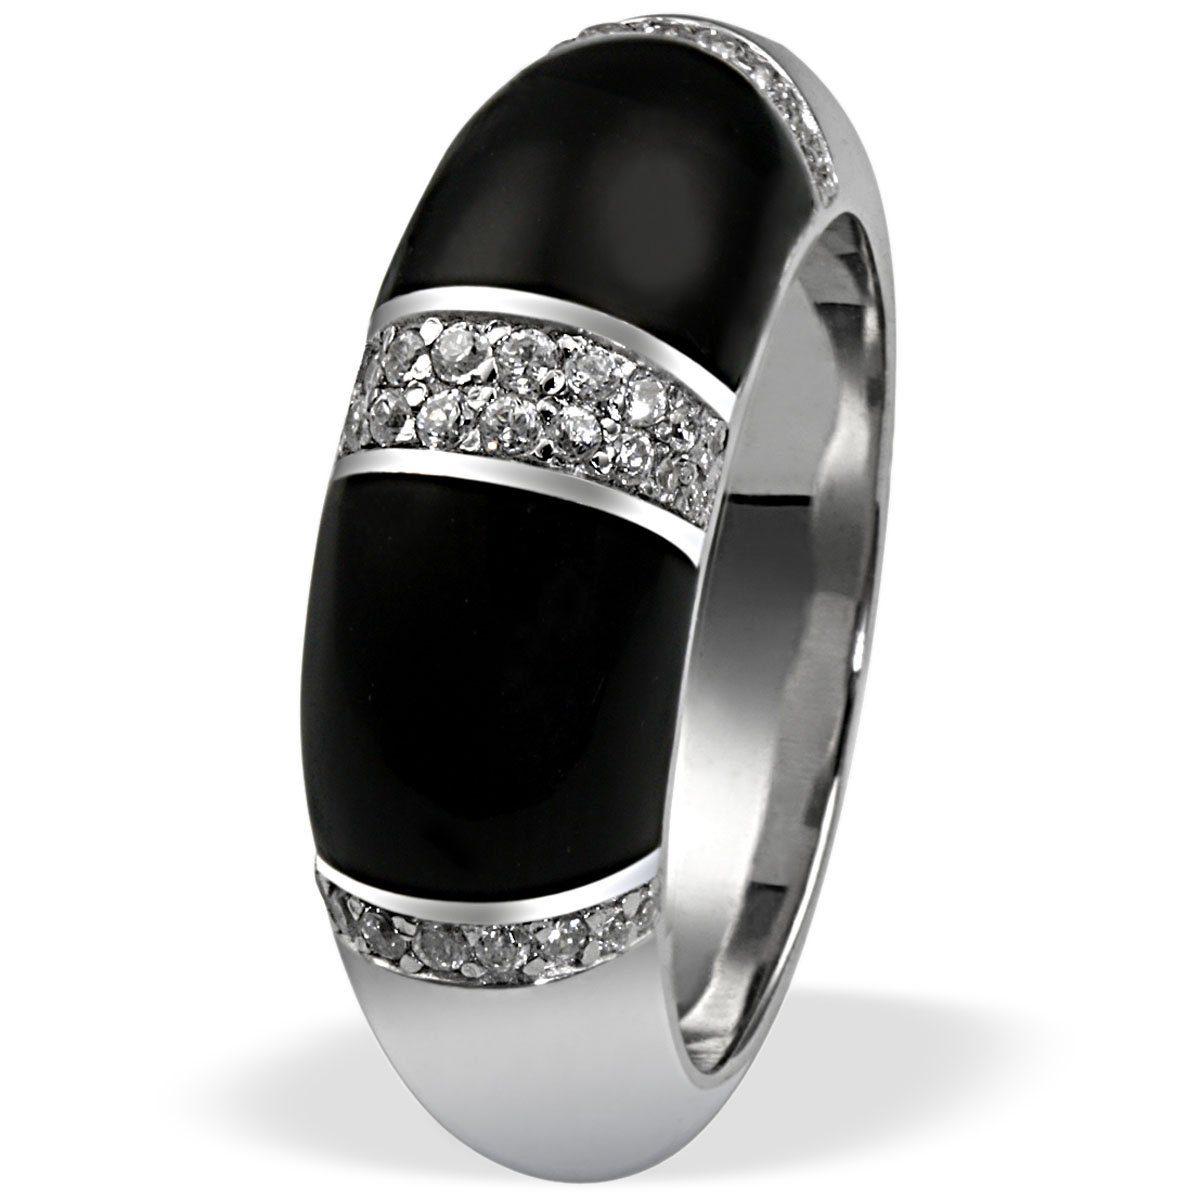 Averdin Damenring Silber 925/- Zirkonia schwarze Flächen massiv jetztbilligerkaufen